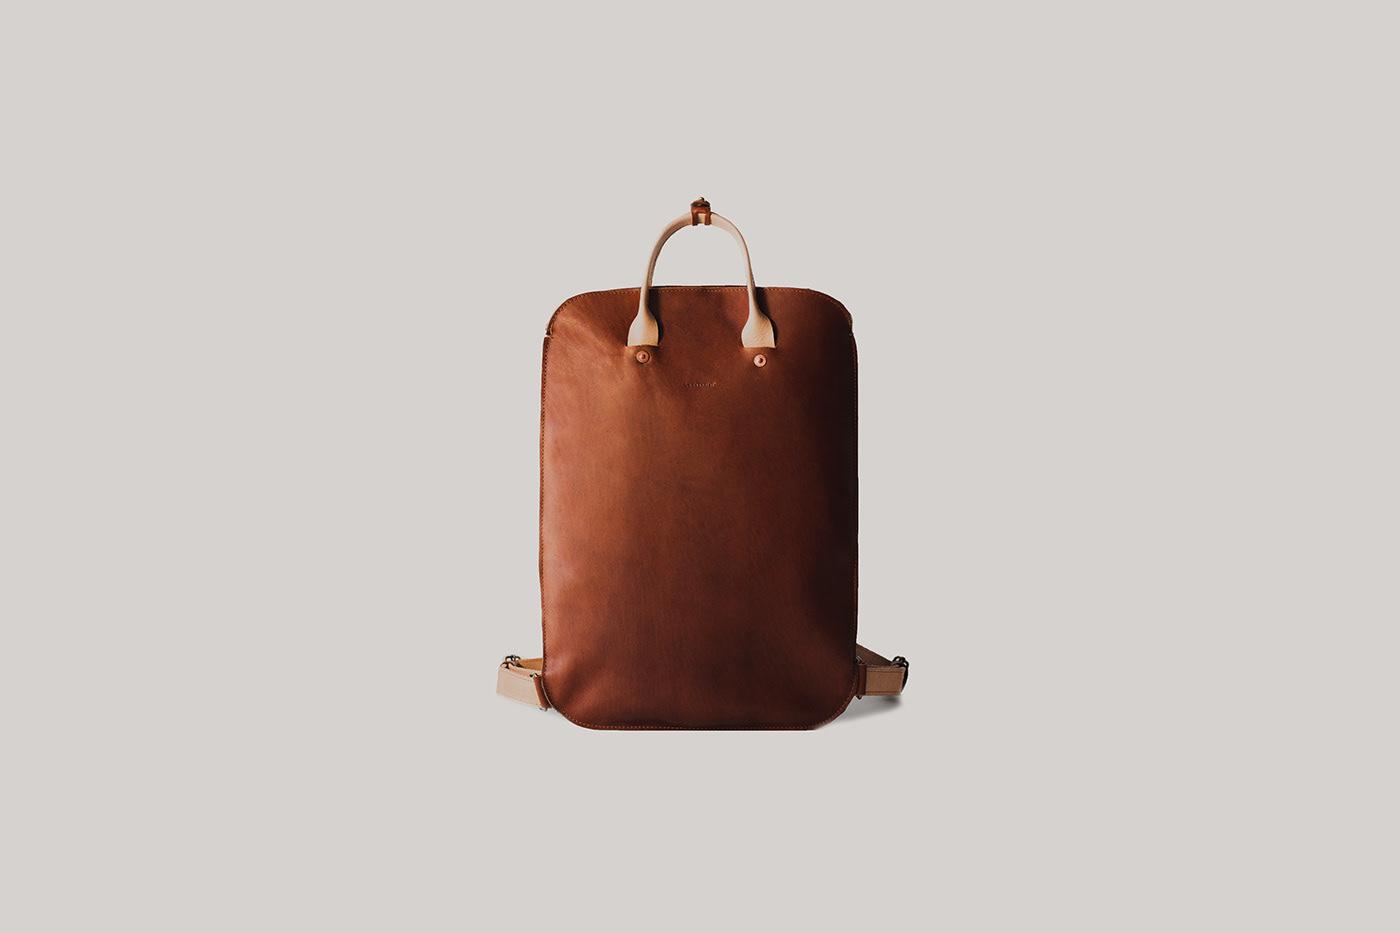 adolfo navarro backpack bag case leather mexico minimal product design